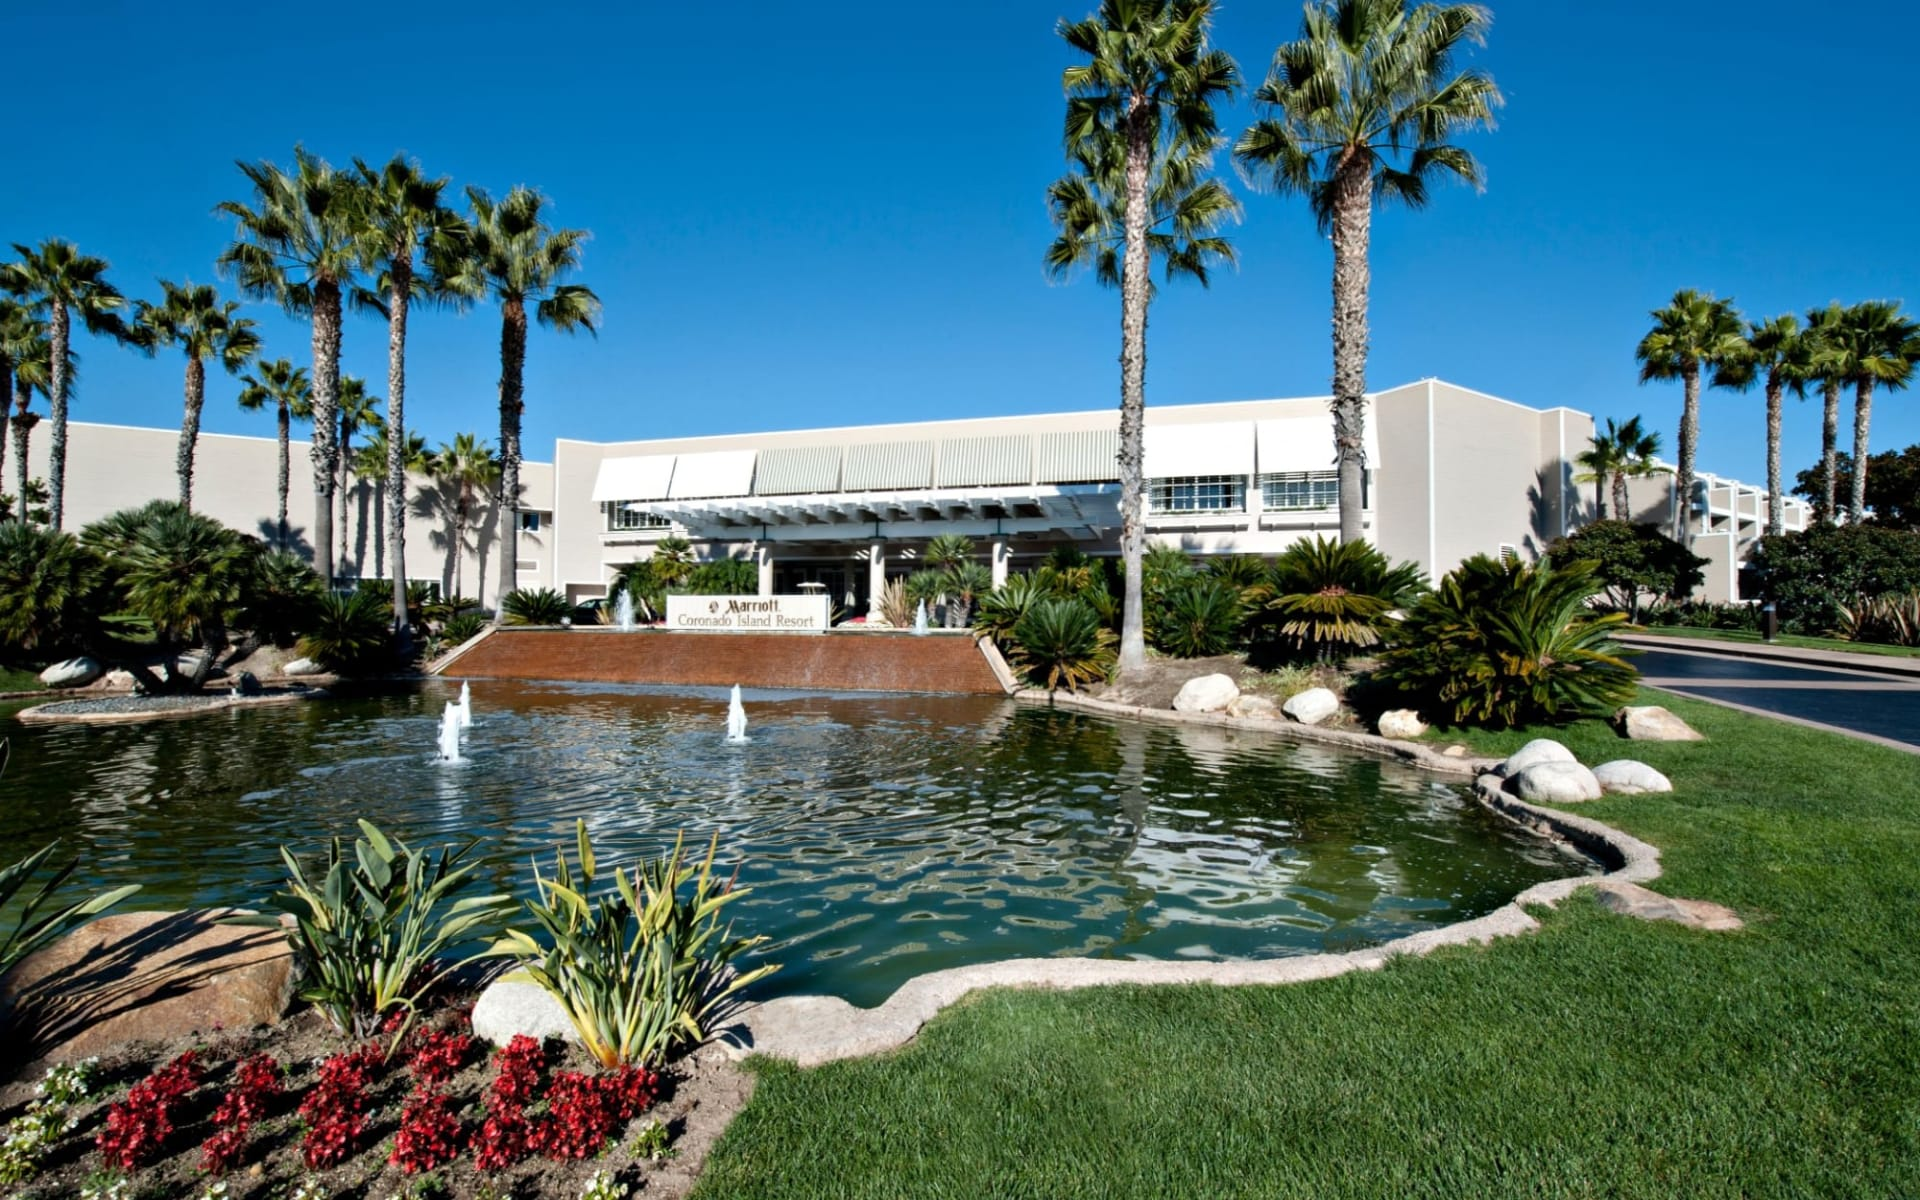 Coronado Island Marriott Resort in San Diego: Exterior_Coronado Island Marriott Resort_Aussenansicht_Bonotel